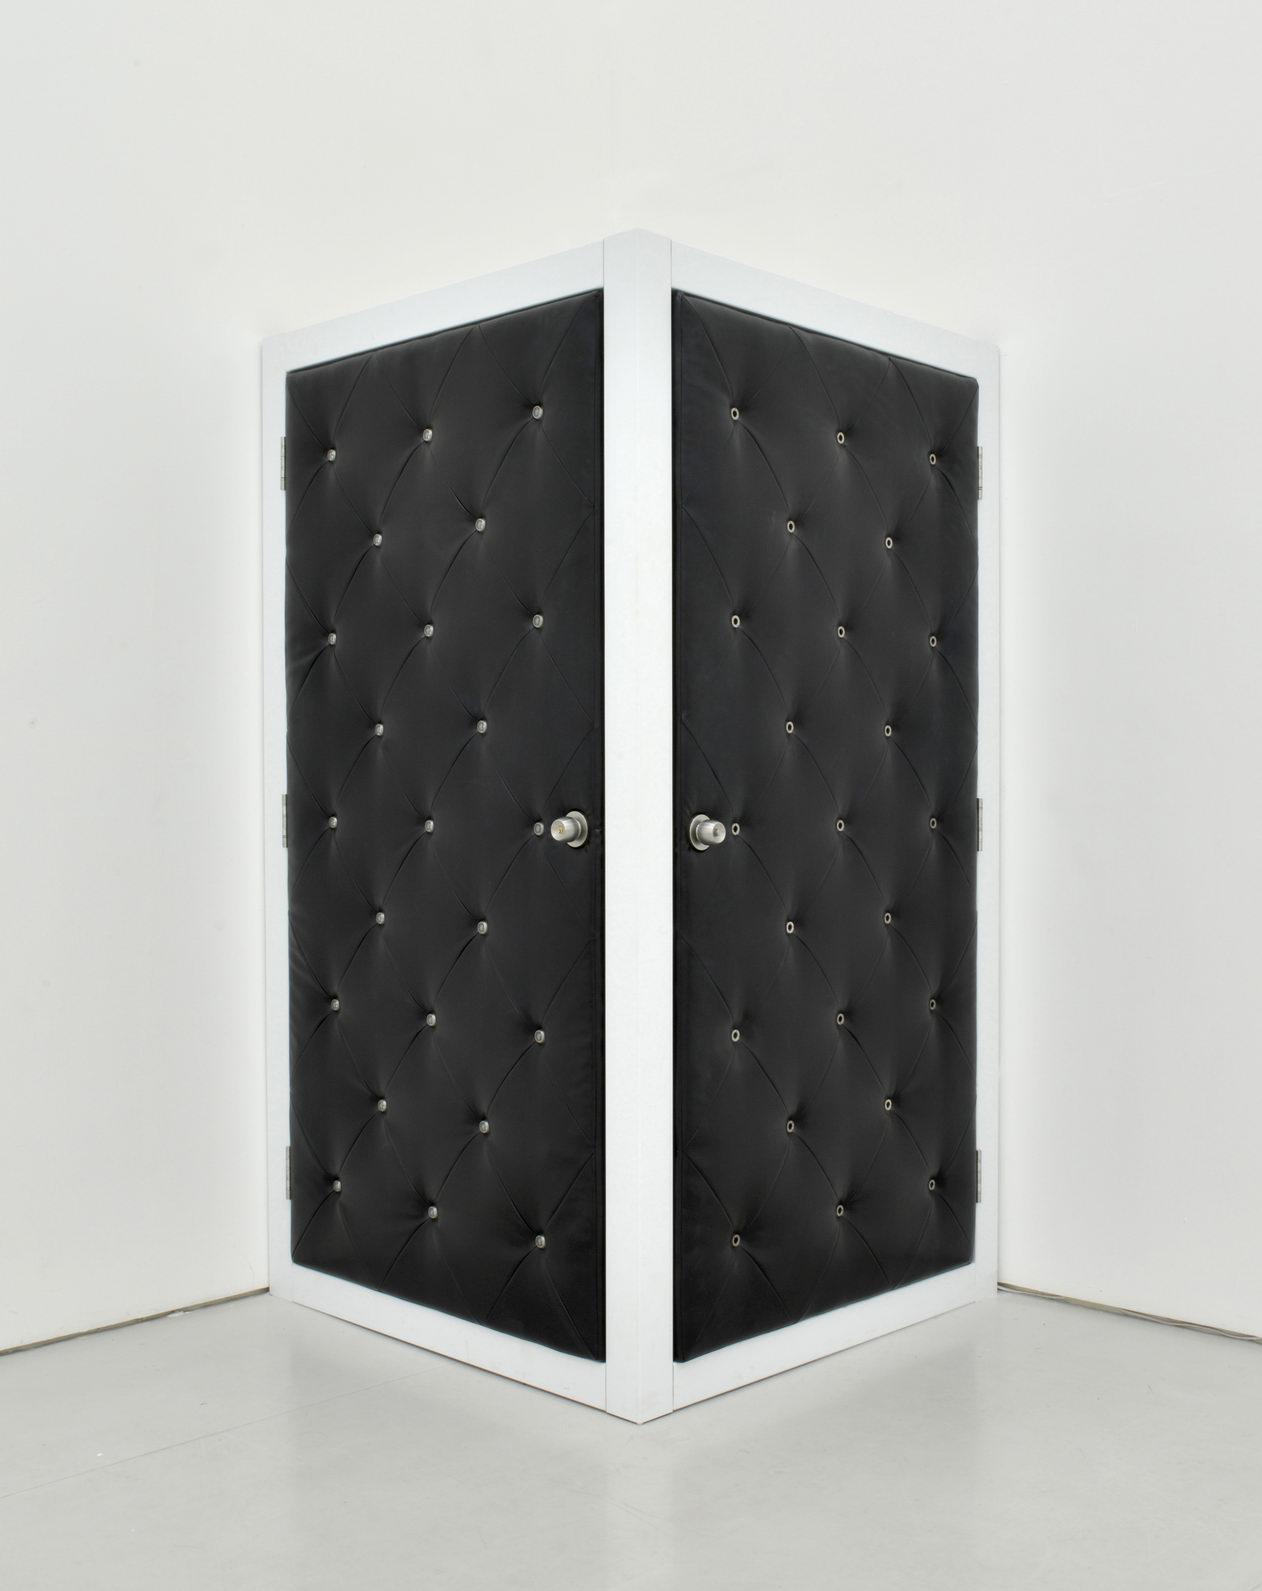 Gao Lei 高磊, L-8937, 2013, Aluminium fake leather peephole dumbbell earphone steel frame 铝、人造皮革、门镜、哑铃、监听耳机、钢架, 130 x 130 x 240 cm